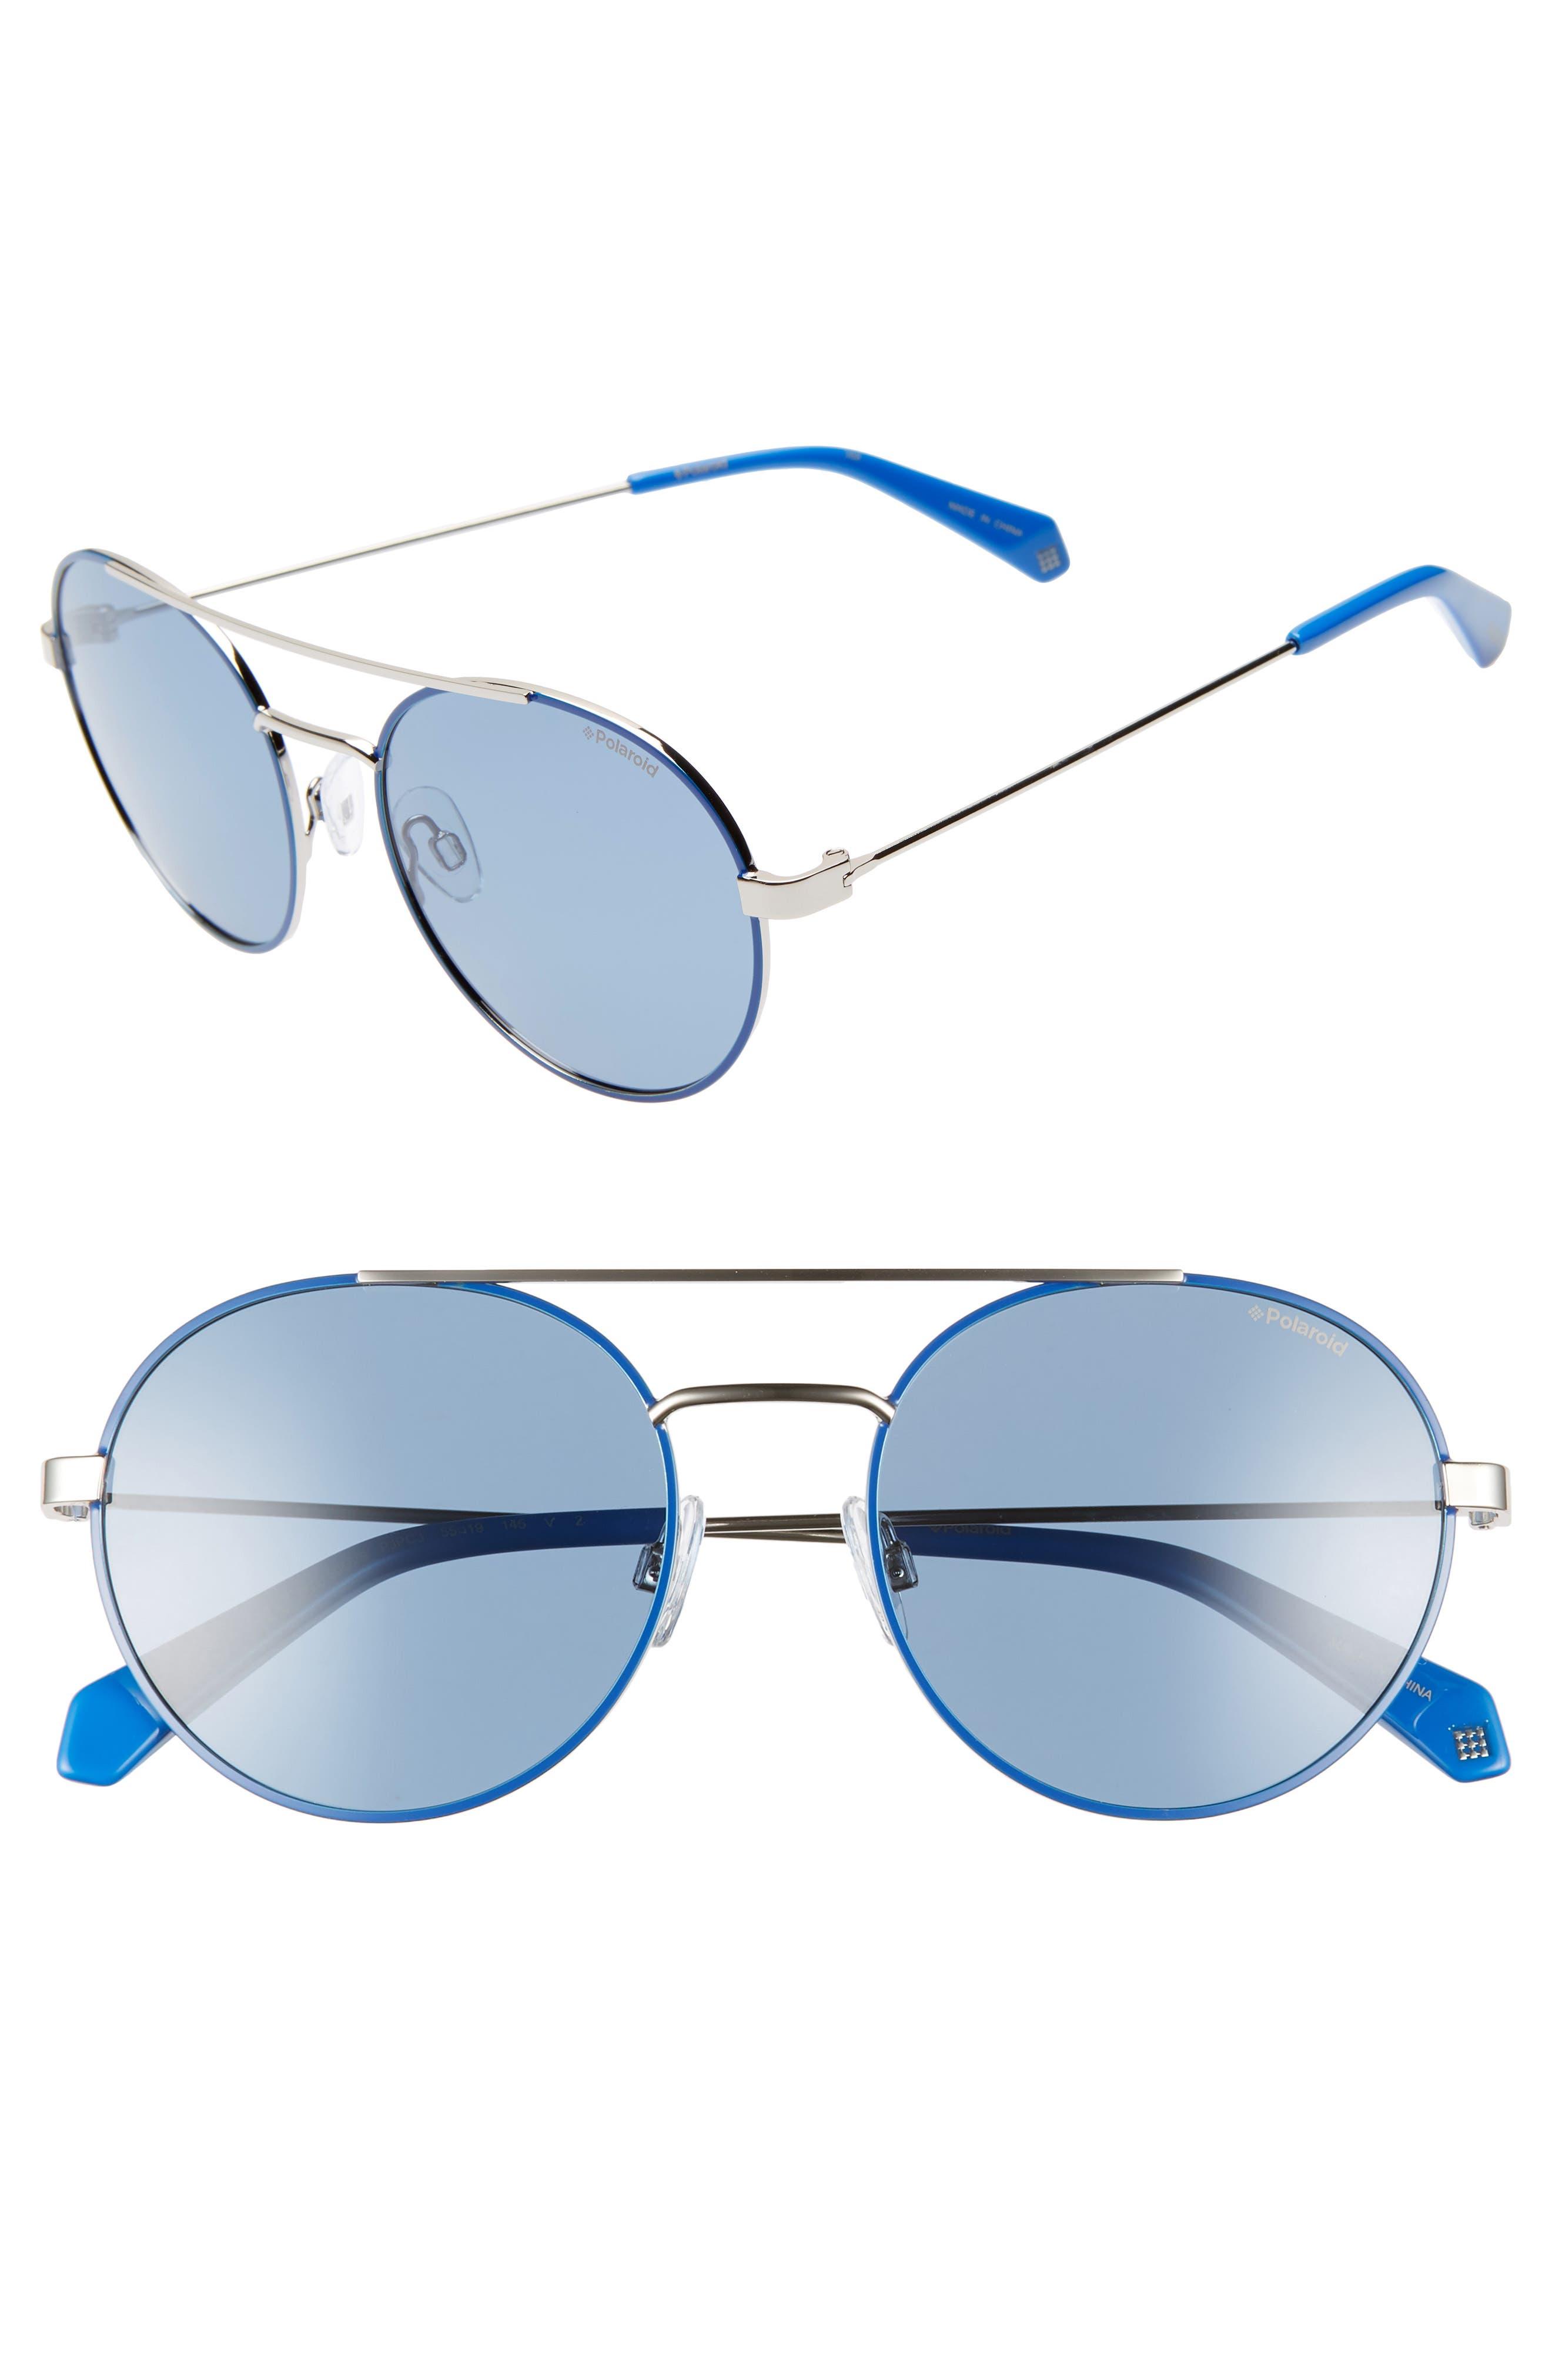 POLAROID Round 55Mm Polarized Sunglasses - Blue